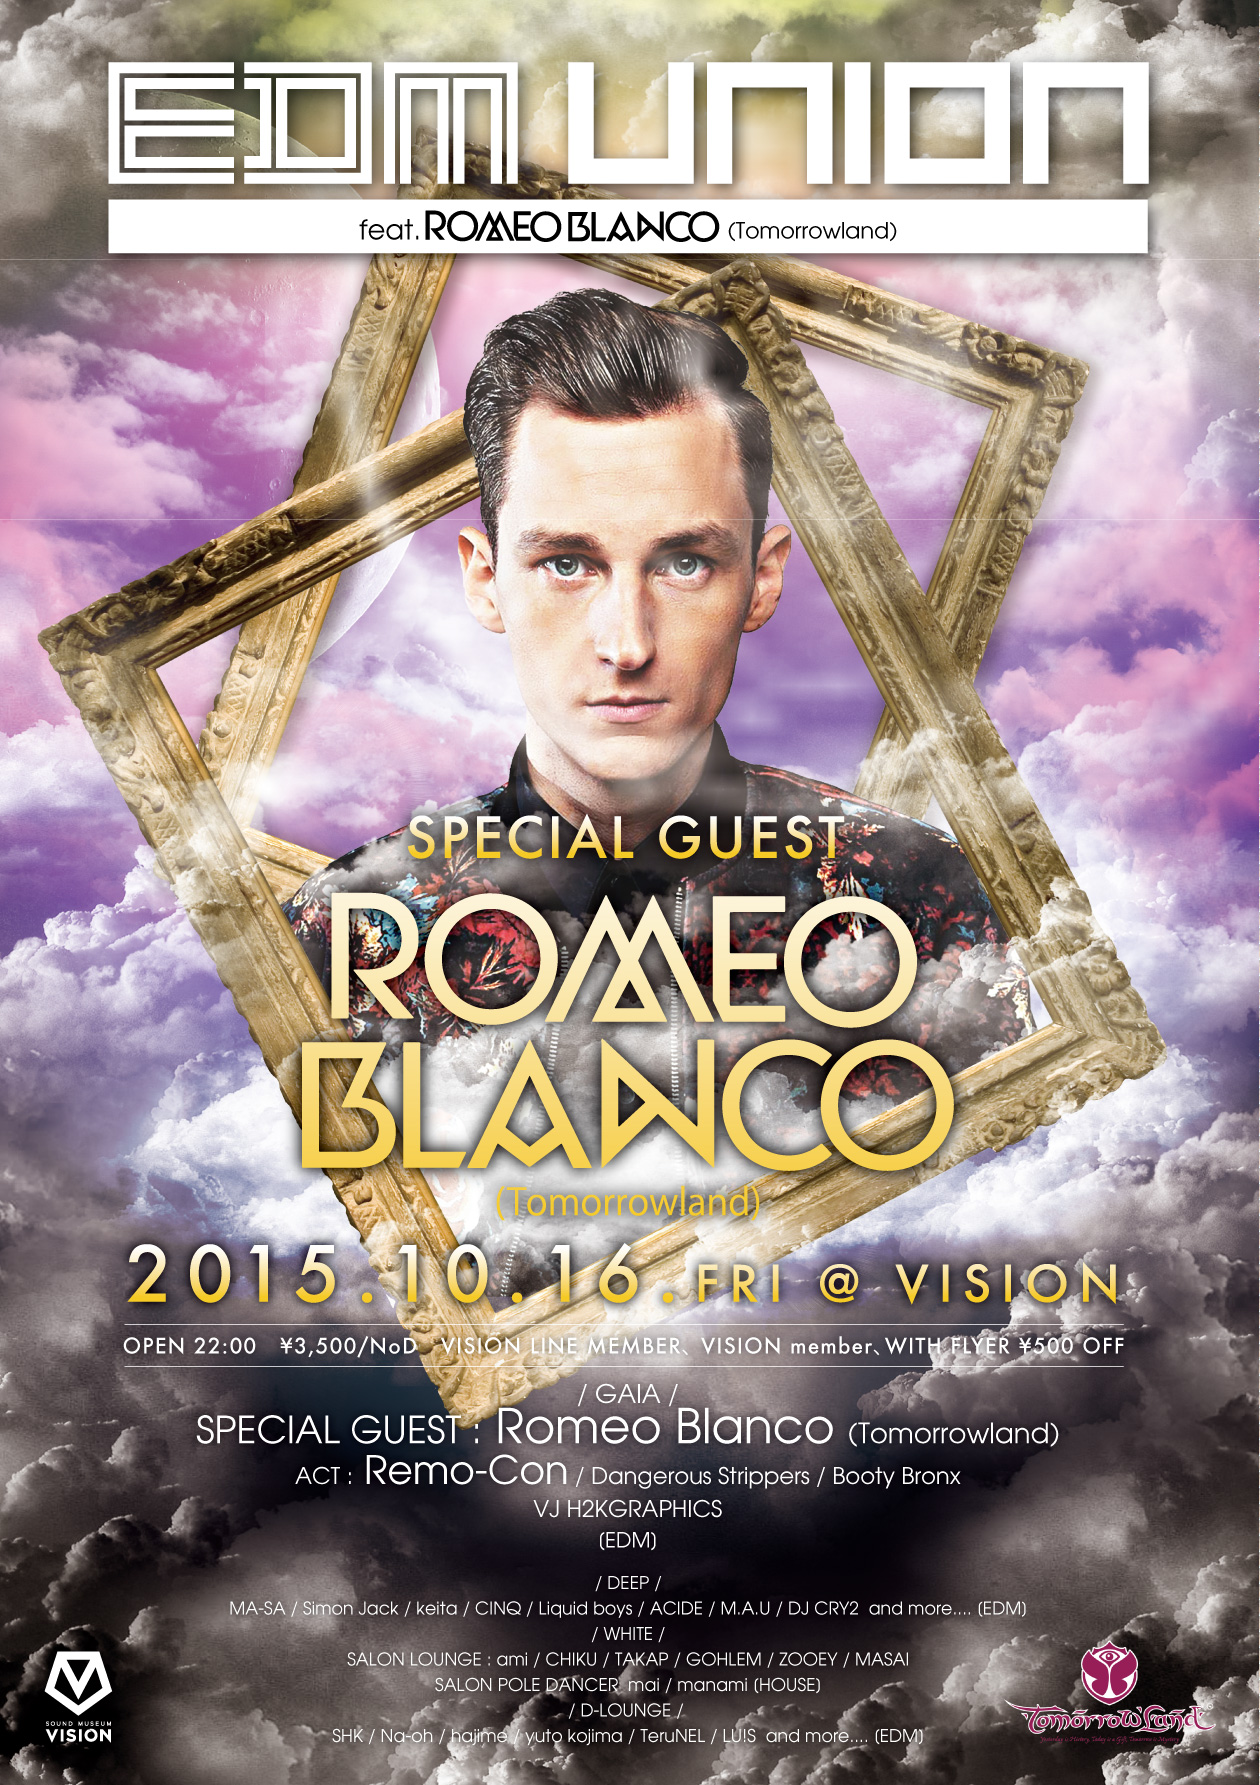 20151016 VISION Romeo Blanco